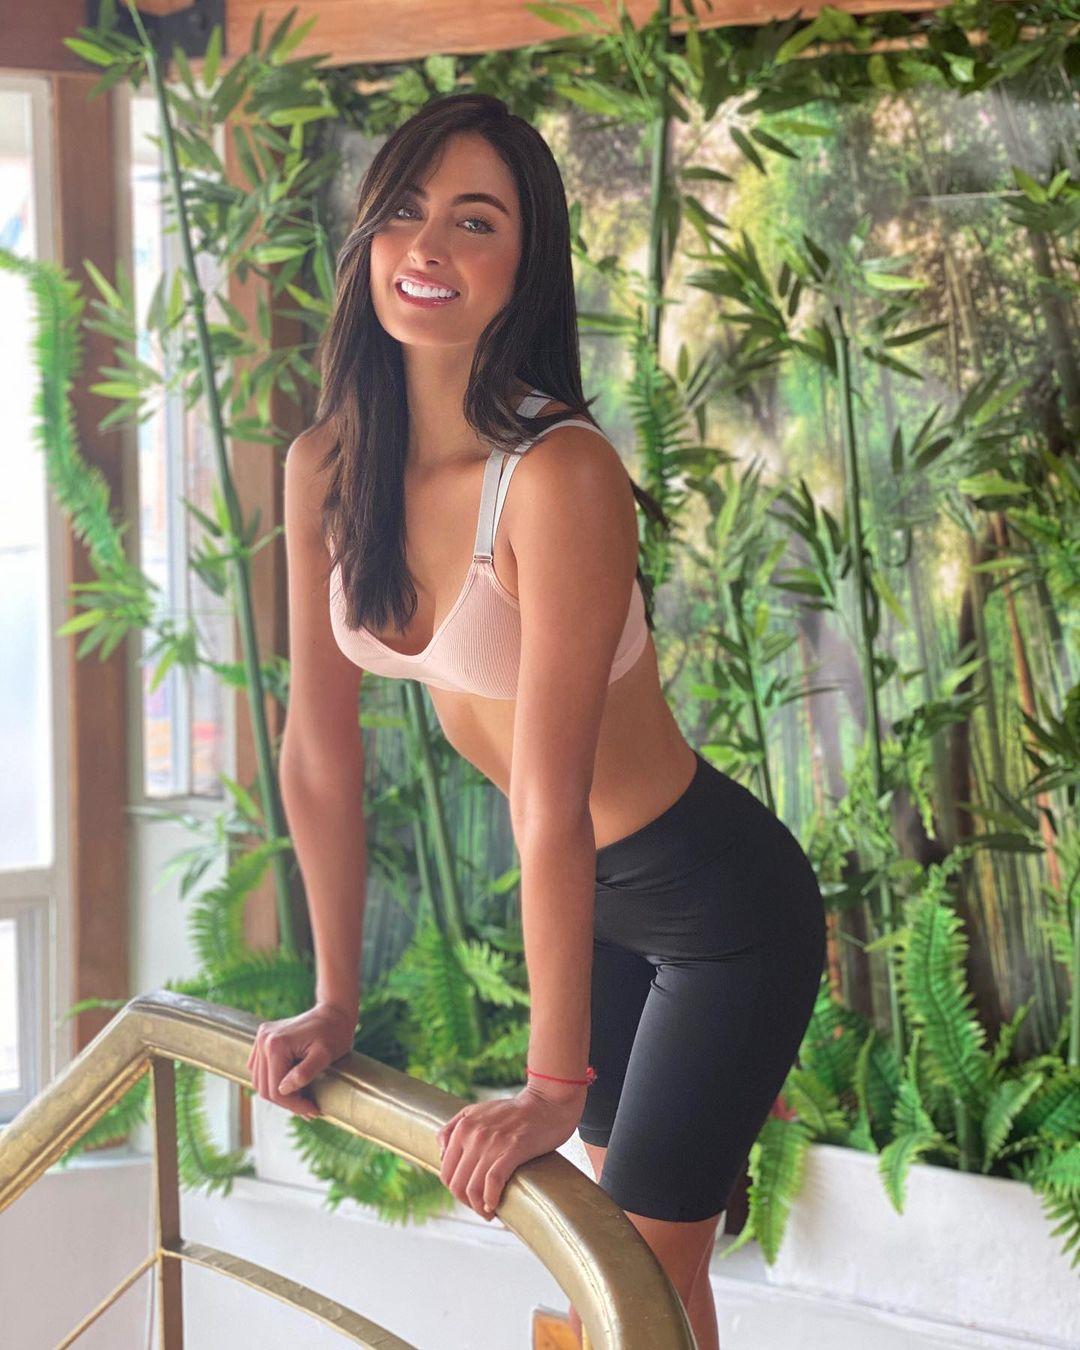 juliana franco, top 16 de miss colombia universo 2020/miss earth water 2017. - Página 21 Julifr17